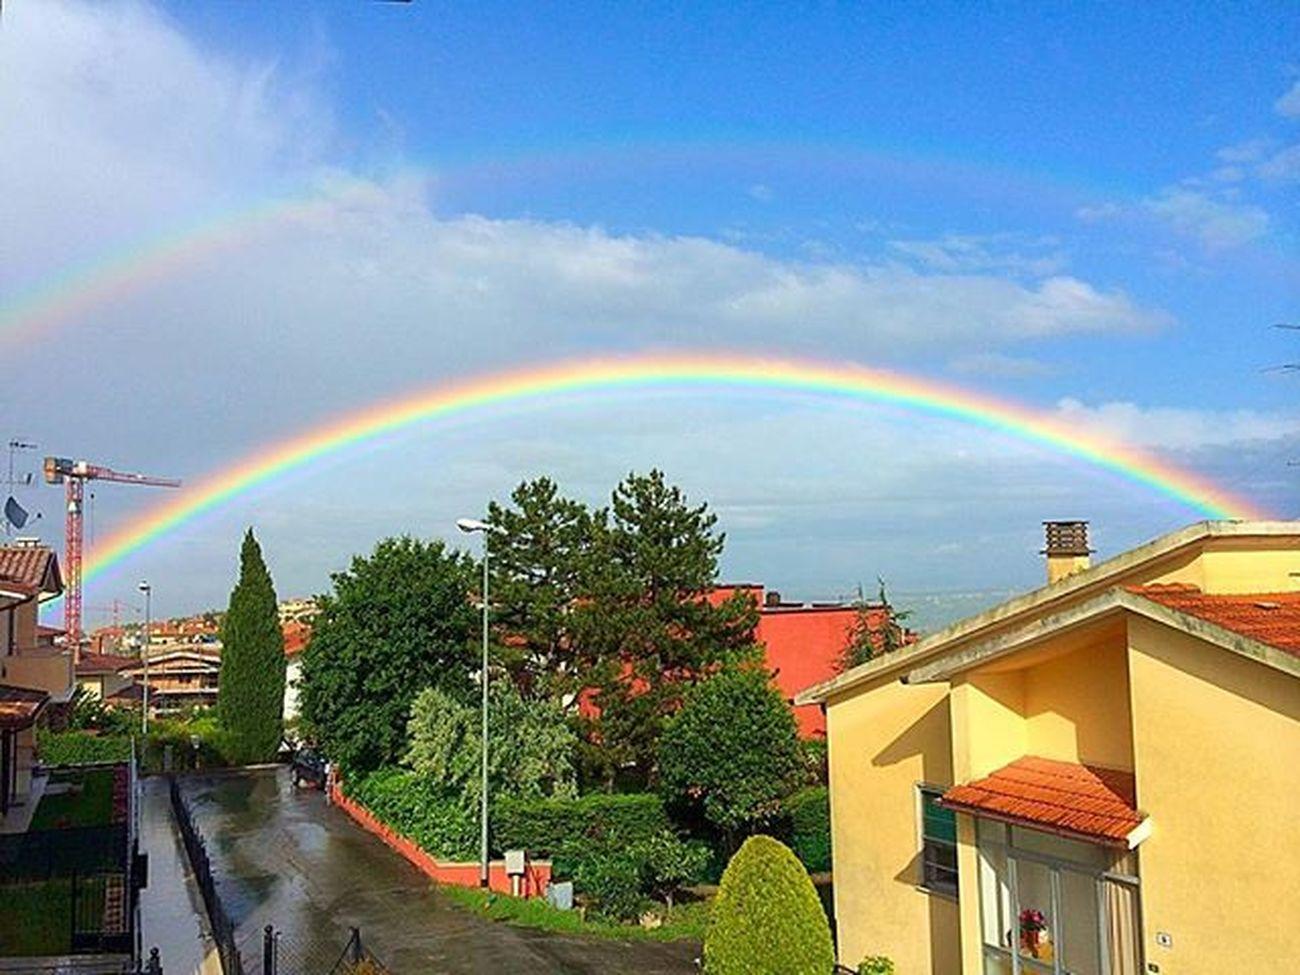 Arcobaleno...doppio! 😄😃🌈🌈 Rainbow Skycolors Colors Arcobaleno  Skylovers Instamoment Instapic Instaphoto Beautiful Beautifulcolors